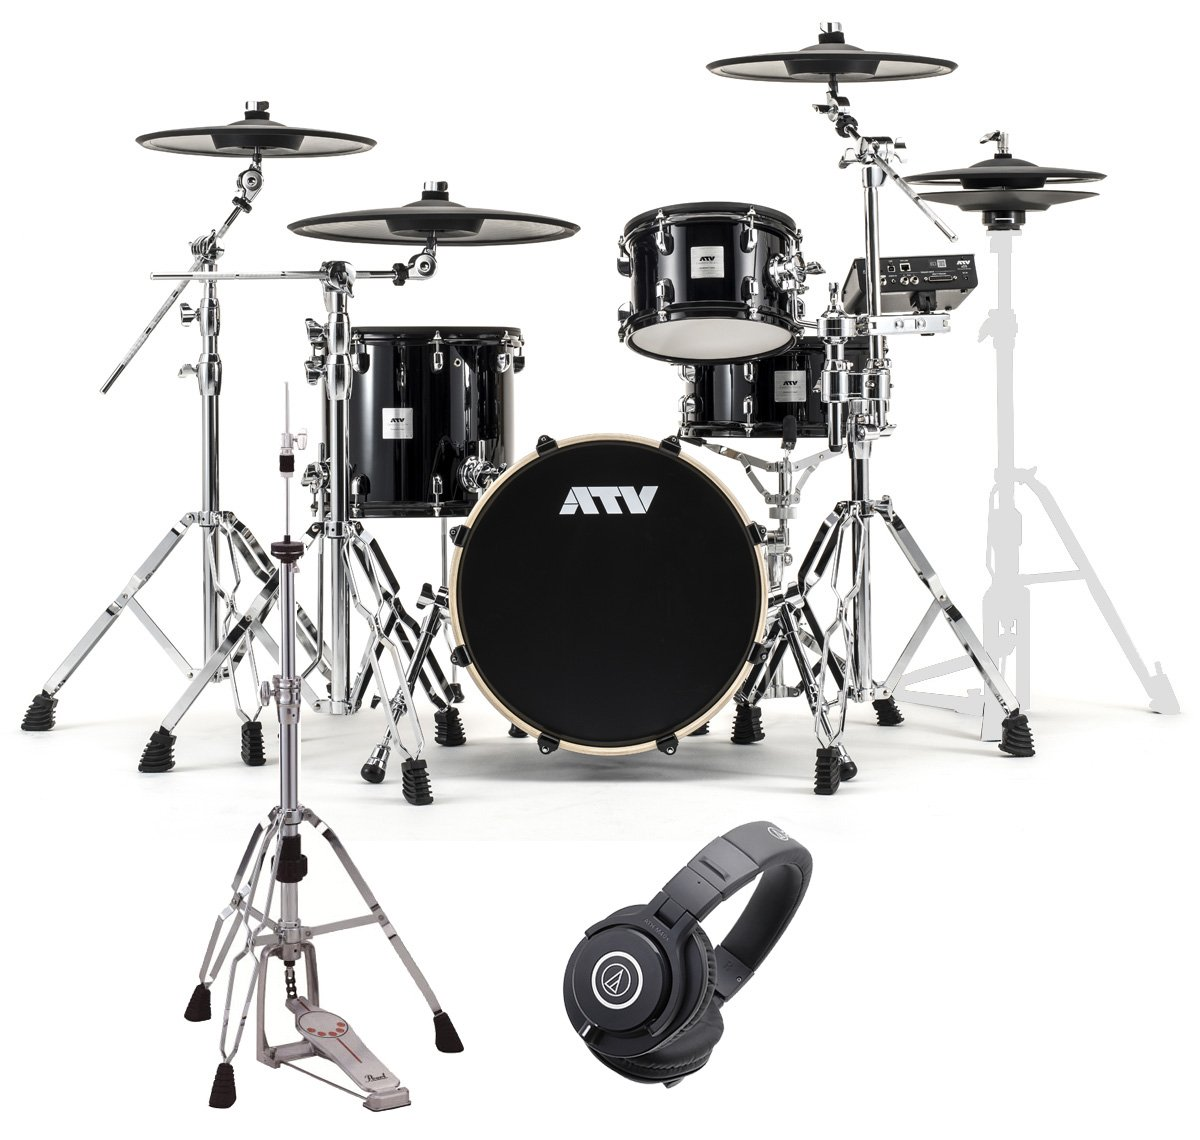 ATV aDrums artist Standard Set ADA-STDSET 3シンバルセット HHスタンドとヘッドホンM40x付き   B07DQBHJ1R